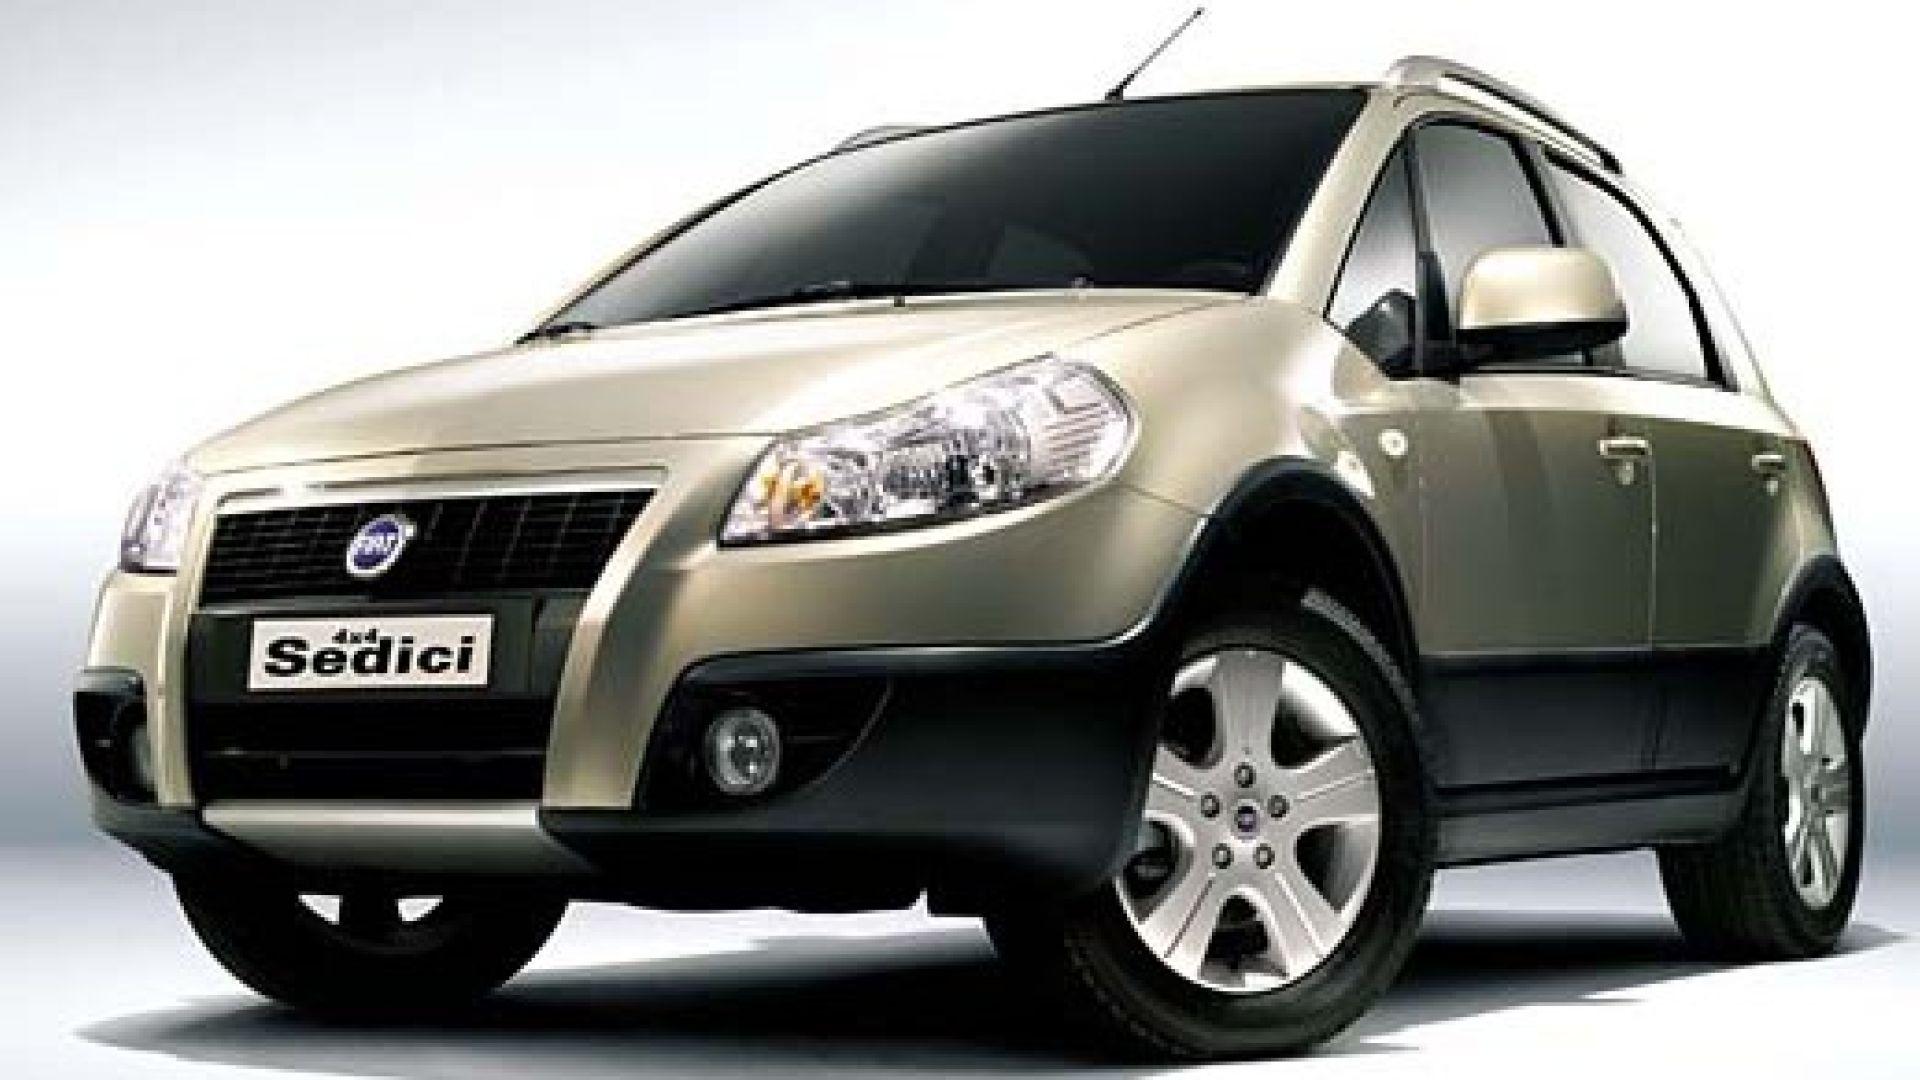 Fiat 16 dimensioni anteprima fiat sedici motorbox for Dimensiones fiat idea